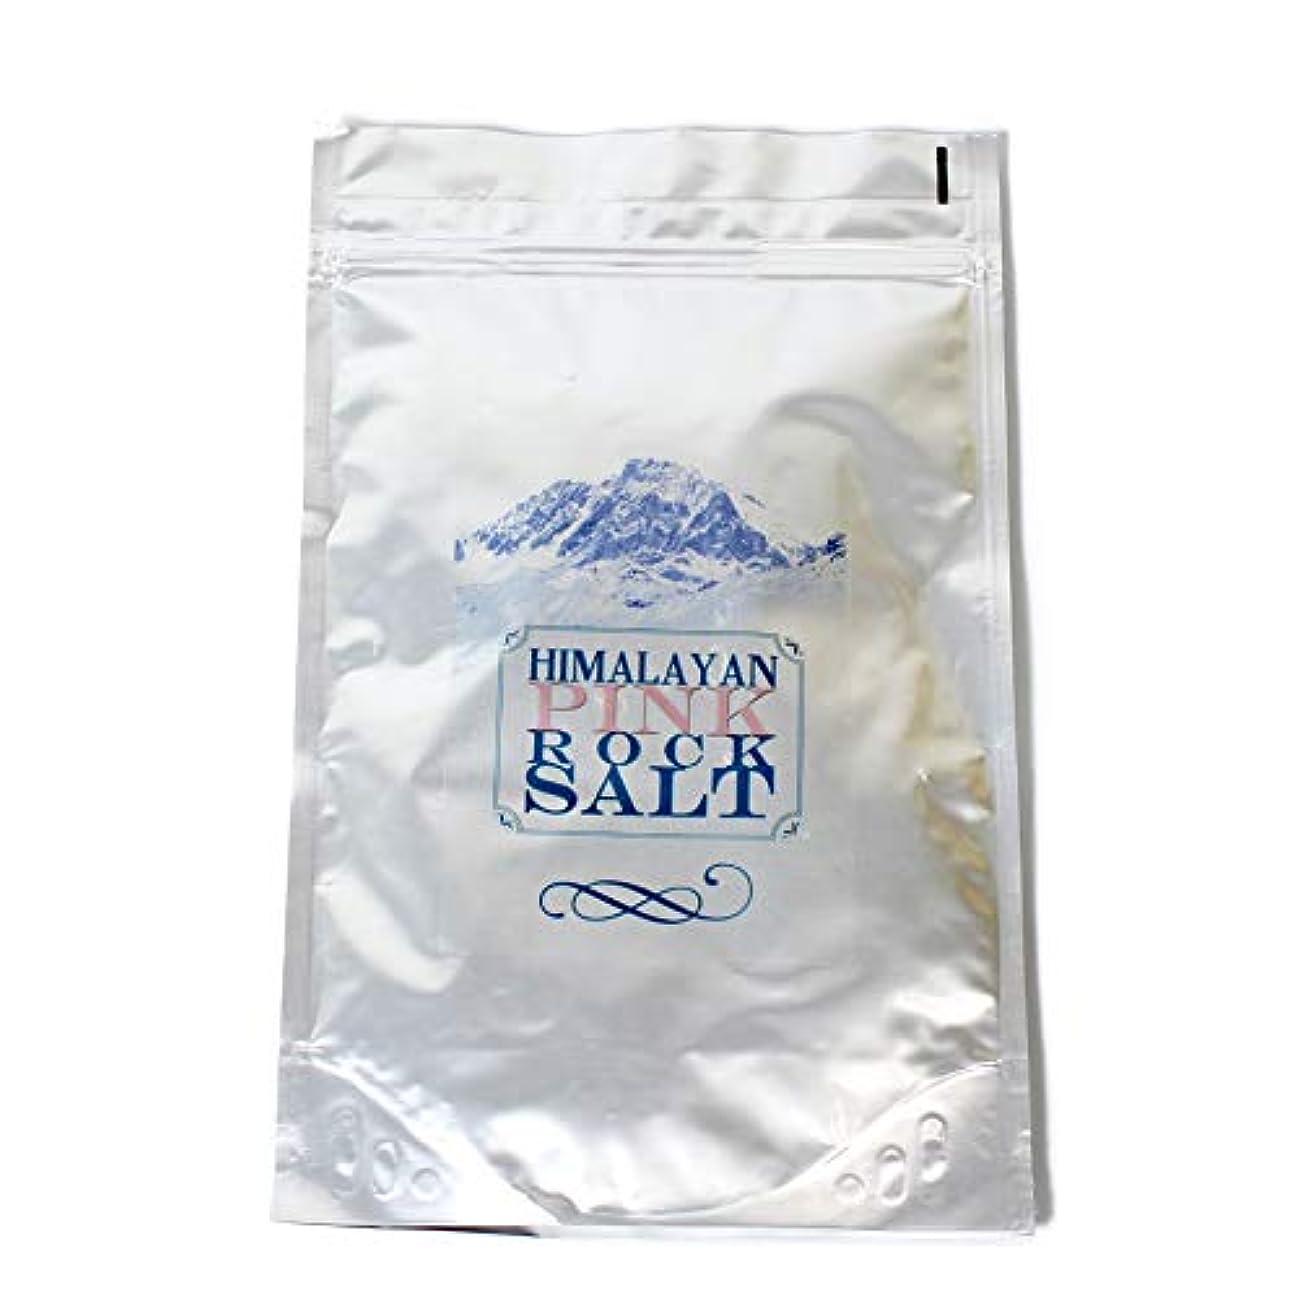 単独で年金受給者哲学Himalayan Pink Rock Salt - 1Kg